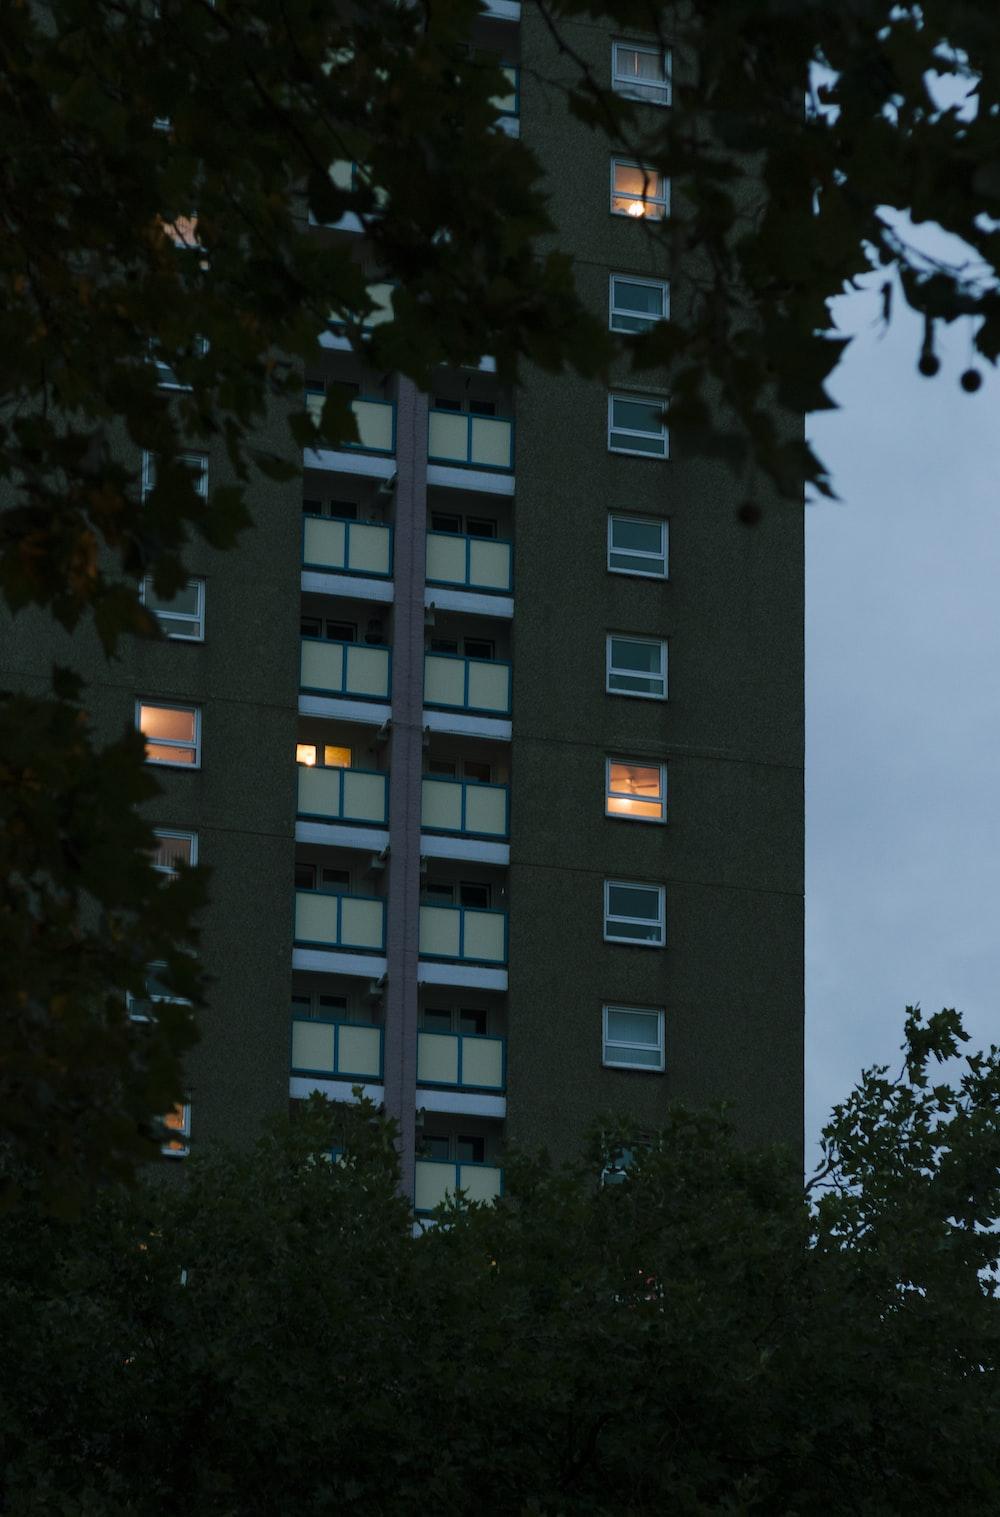 black lighted building